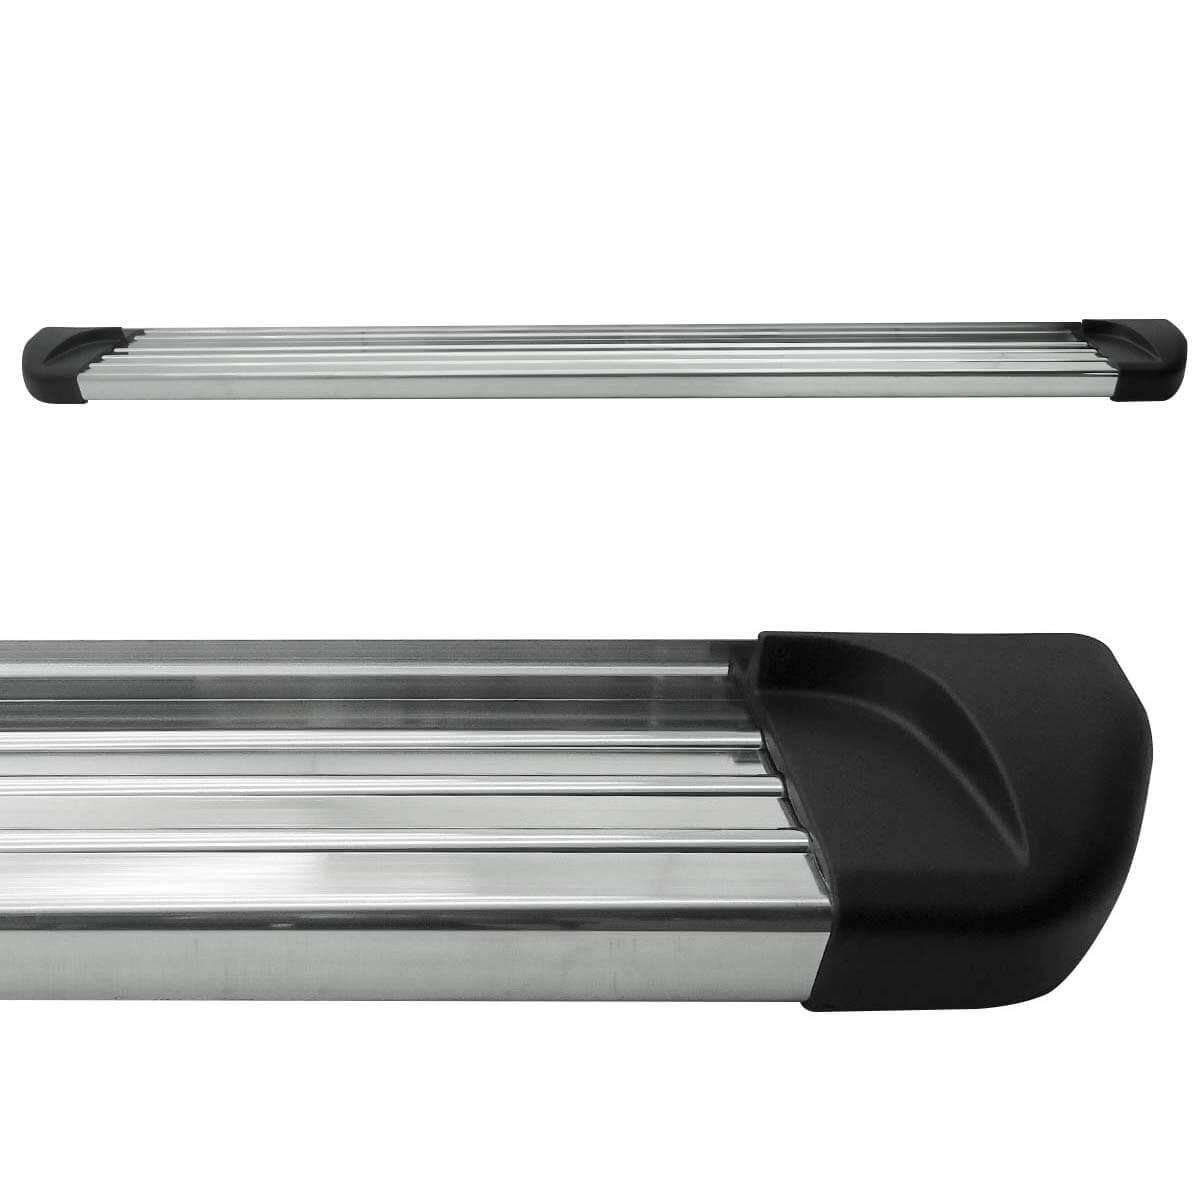 Estribo plataforma alumínio IX35 2011 a 2018